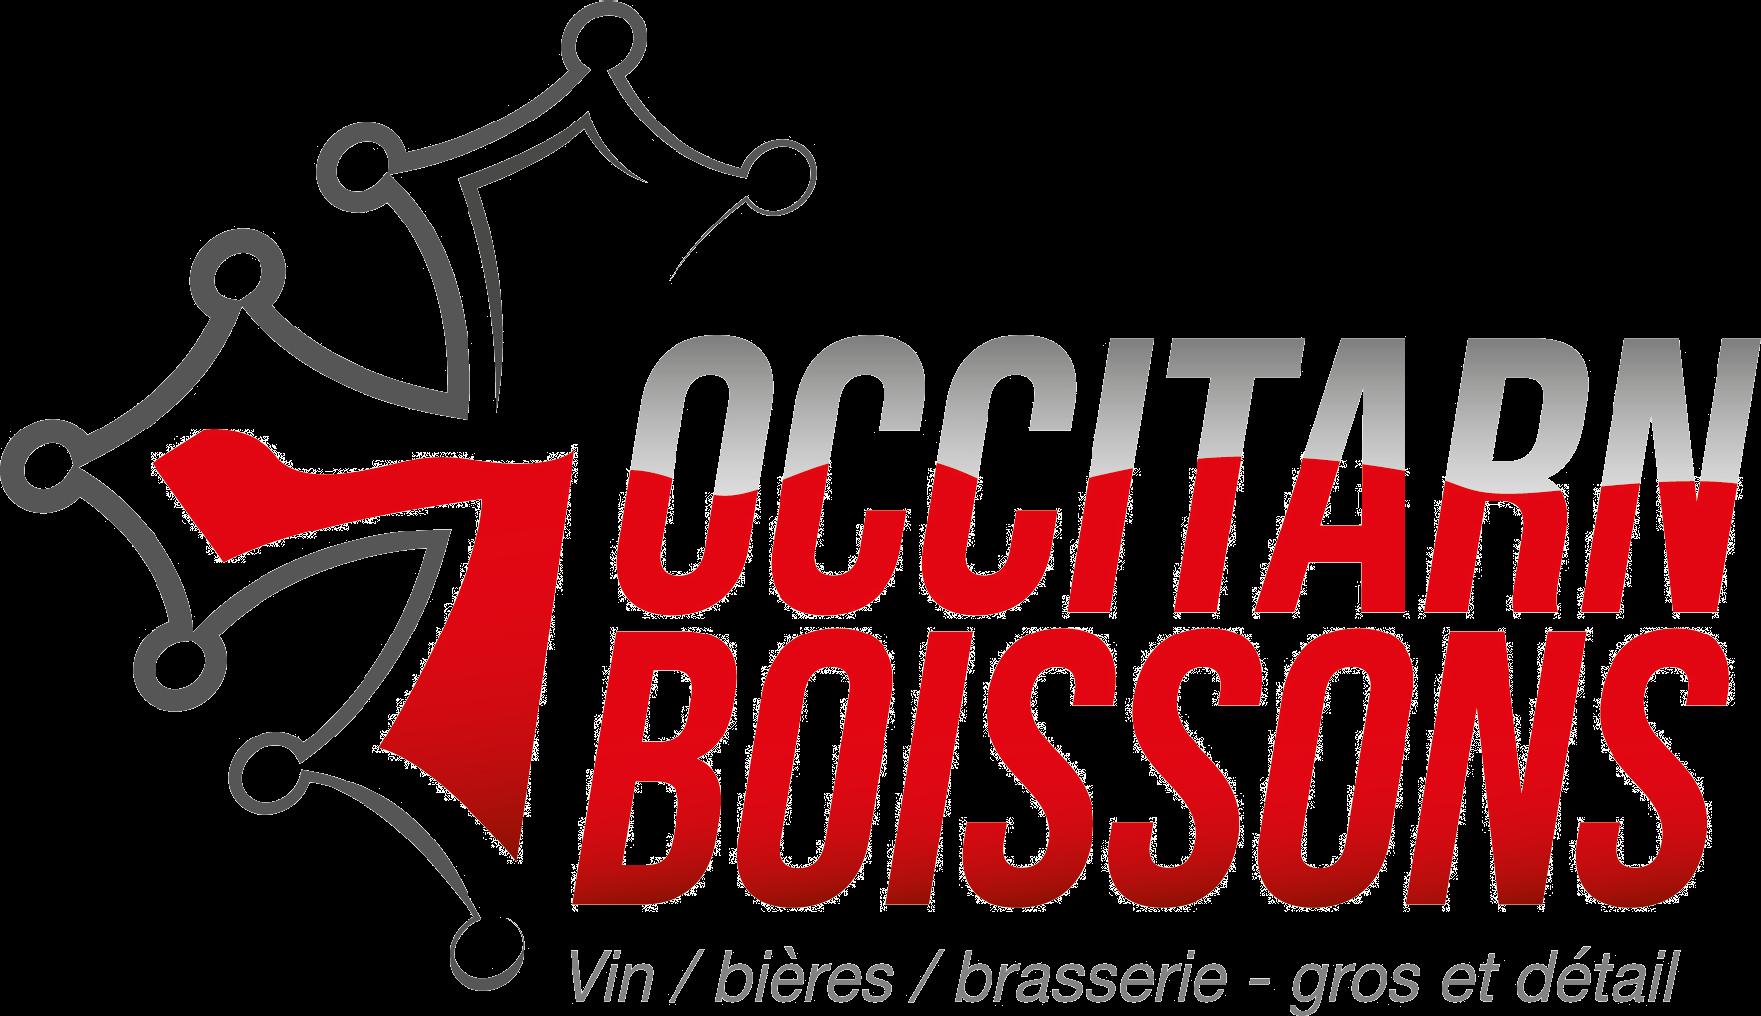 Occitarn Boissons